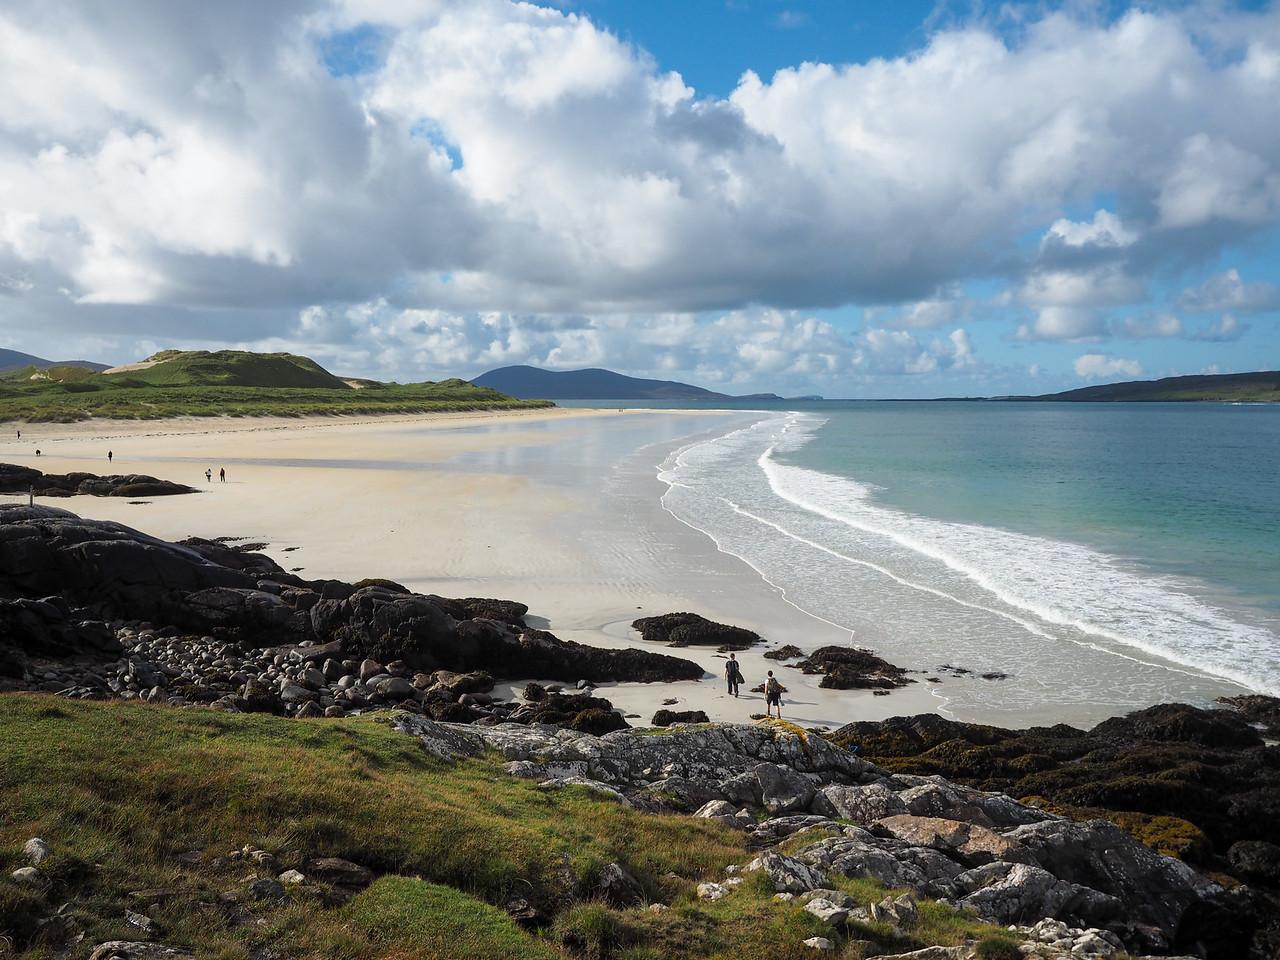 Luskentyre Beach on the Isle of Harris